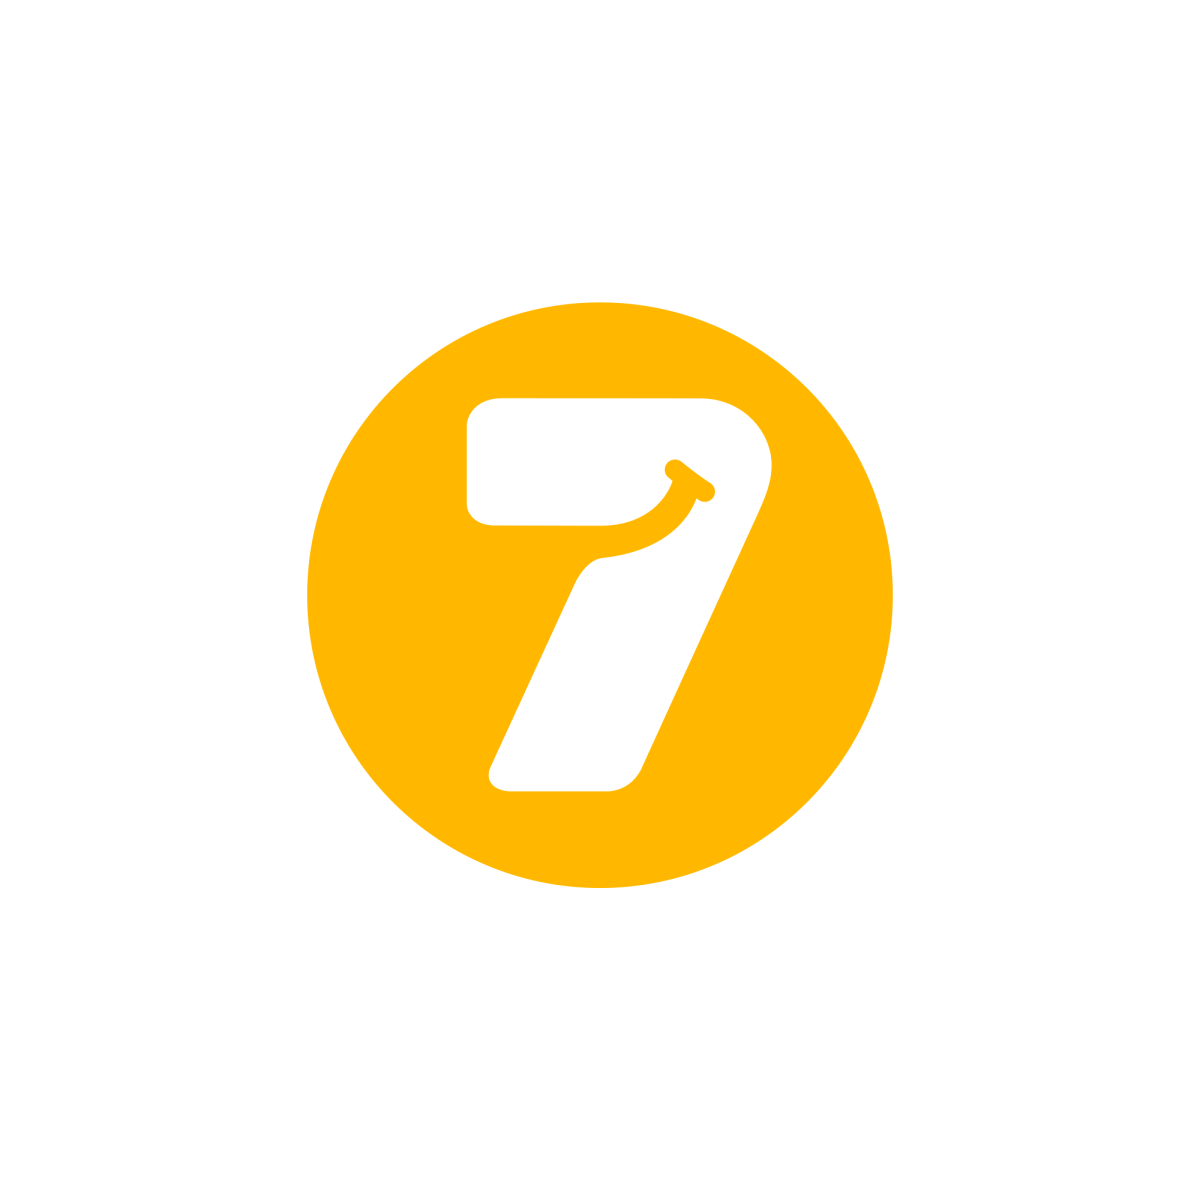 Bbc Radio 7 Logo United Kingdom Bbc Radio 7 Logo Number 7